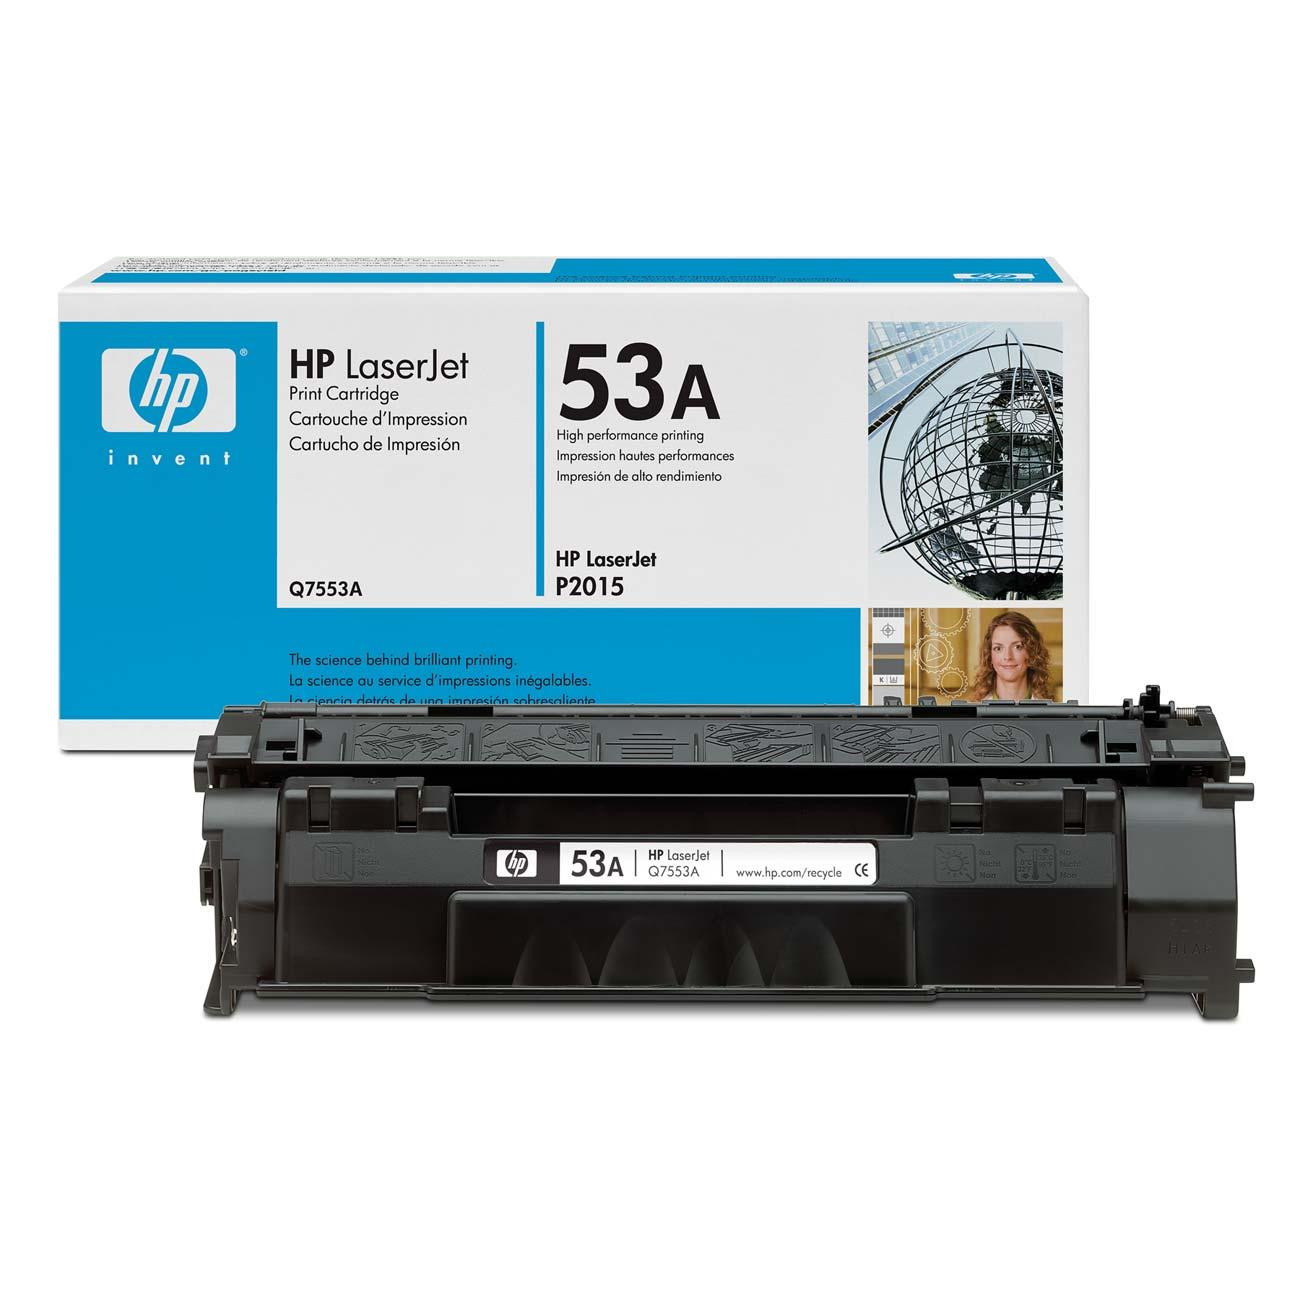 Hp Original Oem Q7553a Black Laser Toner Cartridge